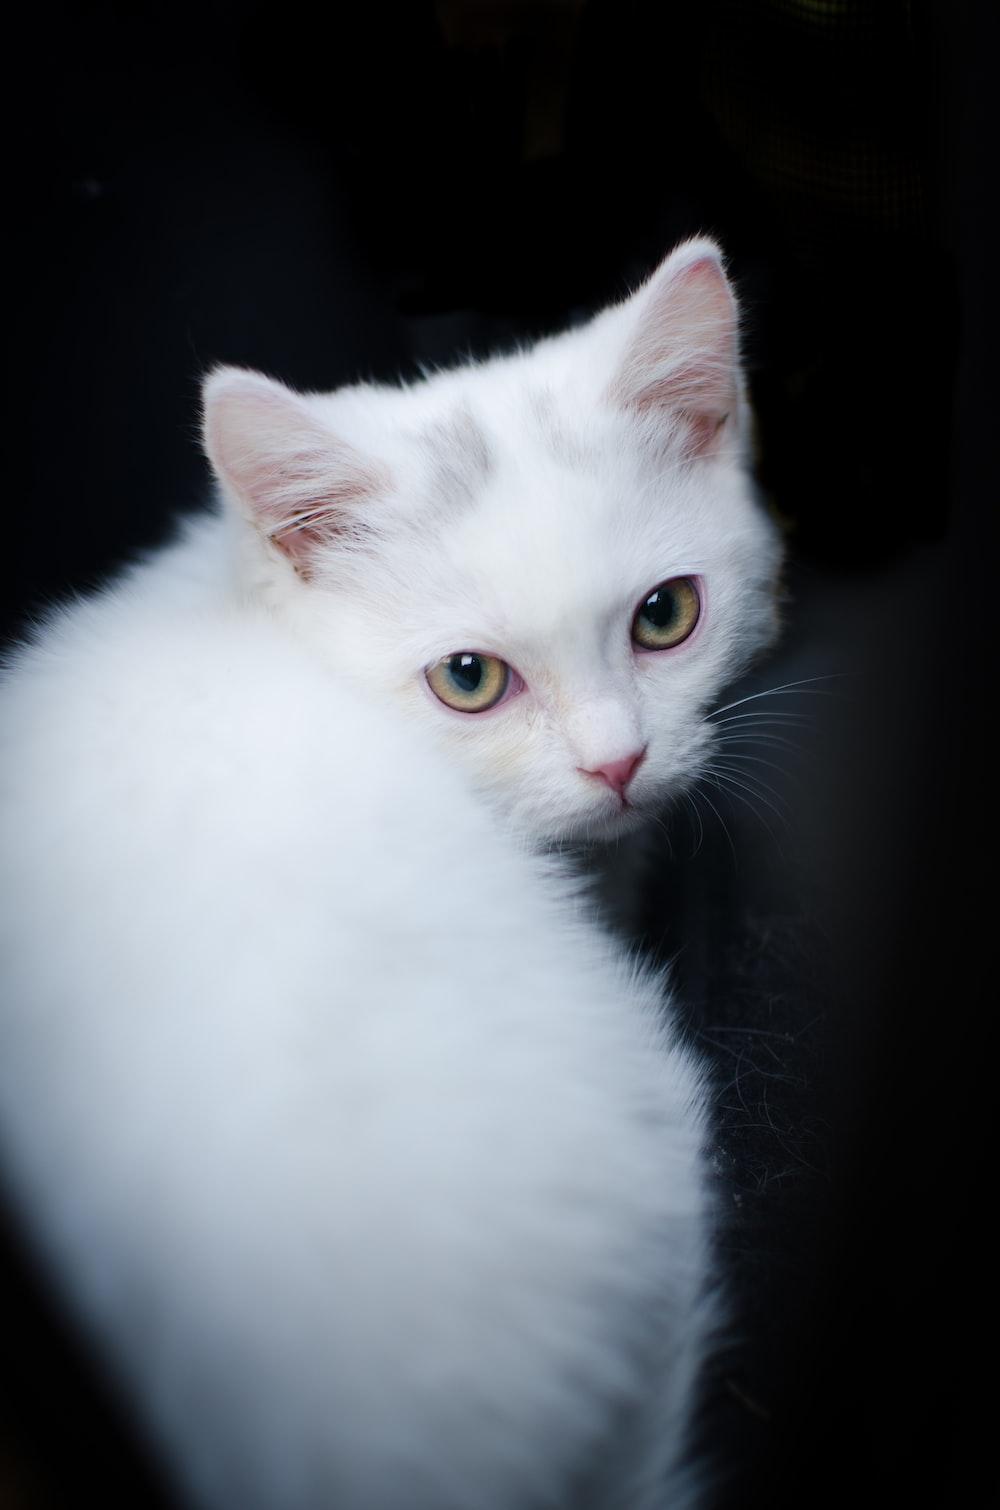 shallow focus photo of white cat